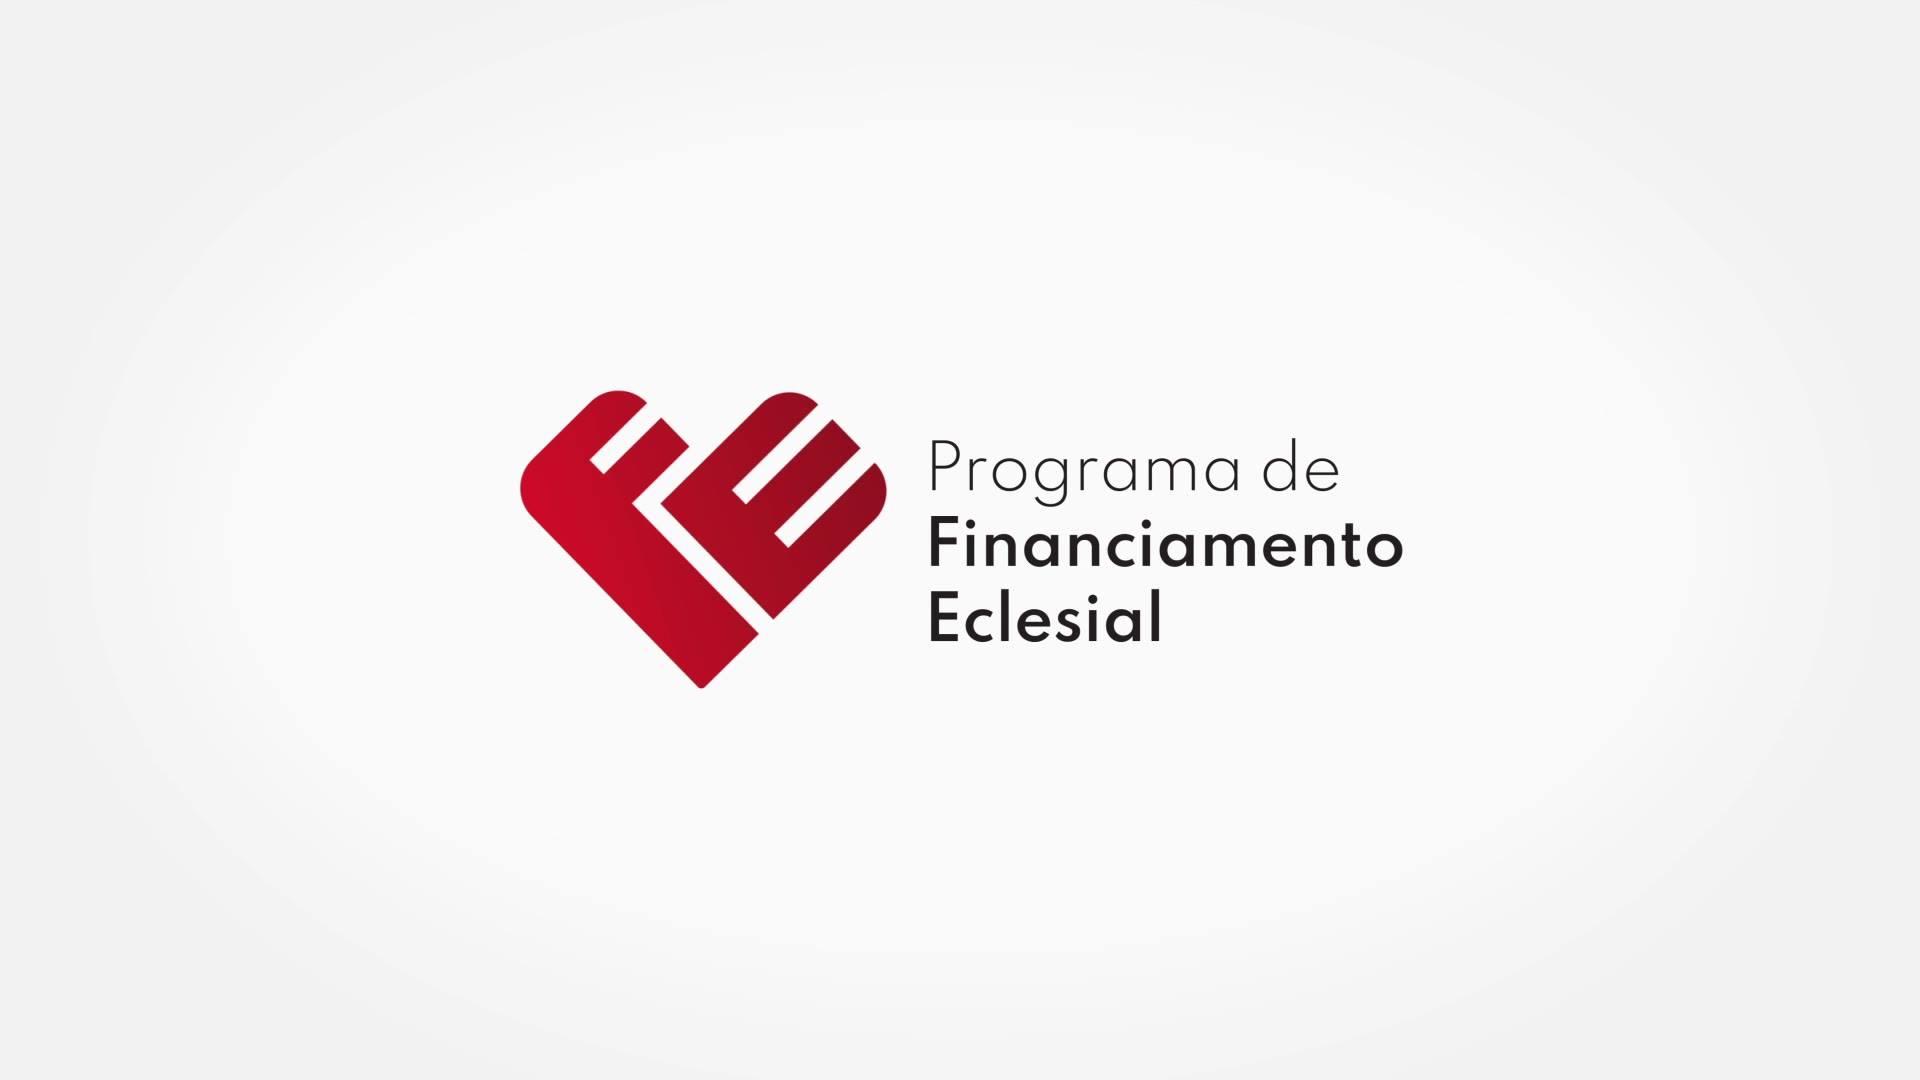 Programa FE : Programa de Financiamiento Eclesial